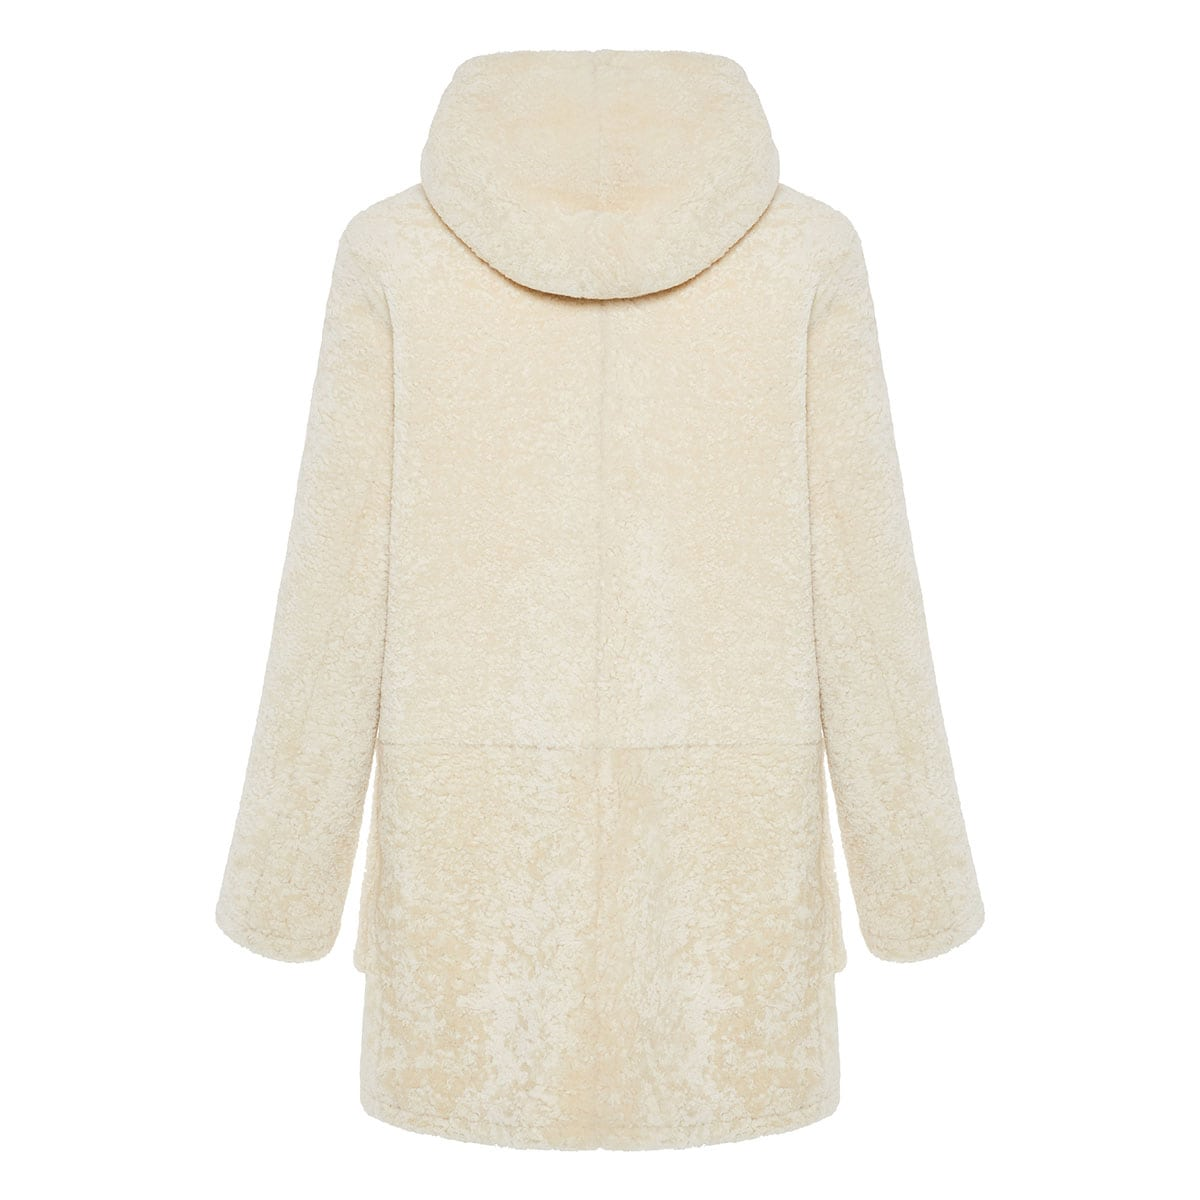 Shearling hooded duffle coat